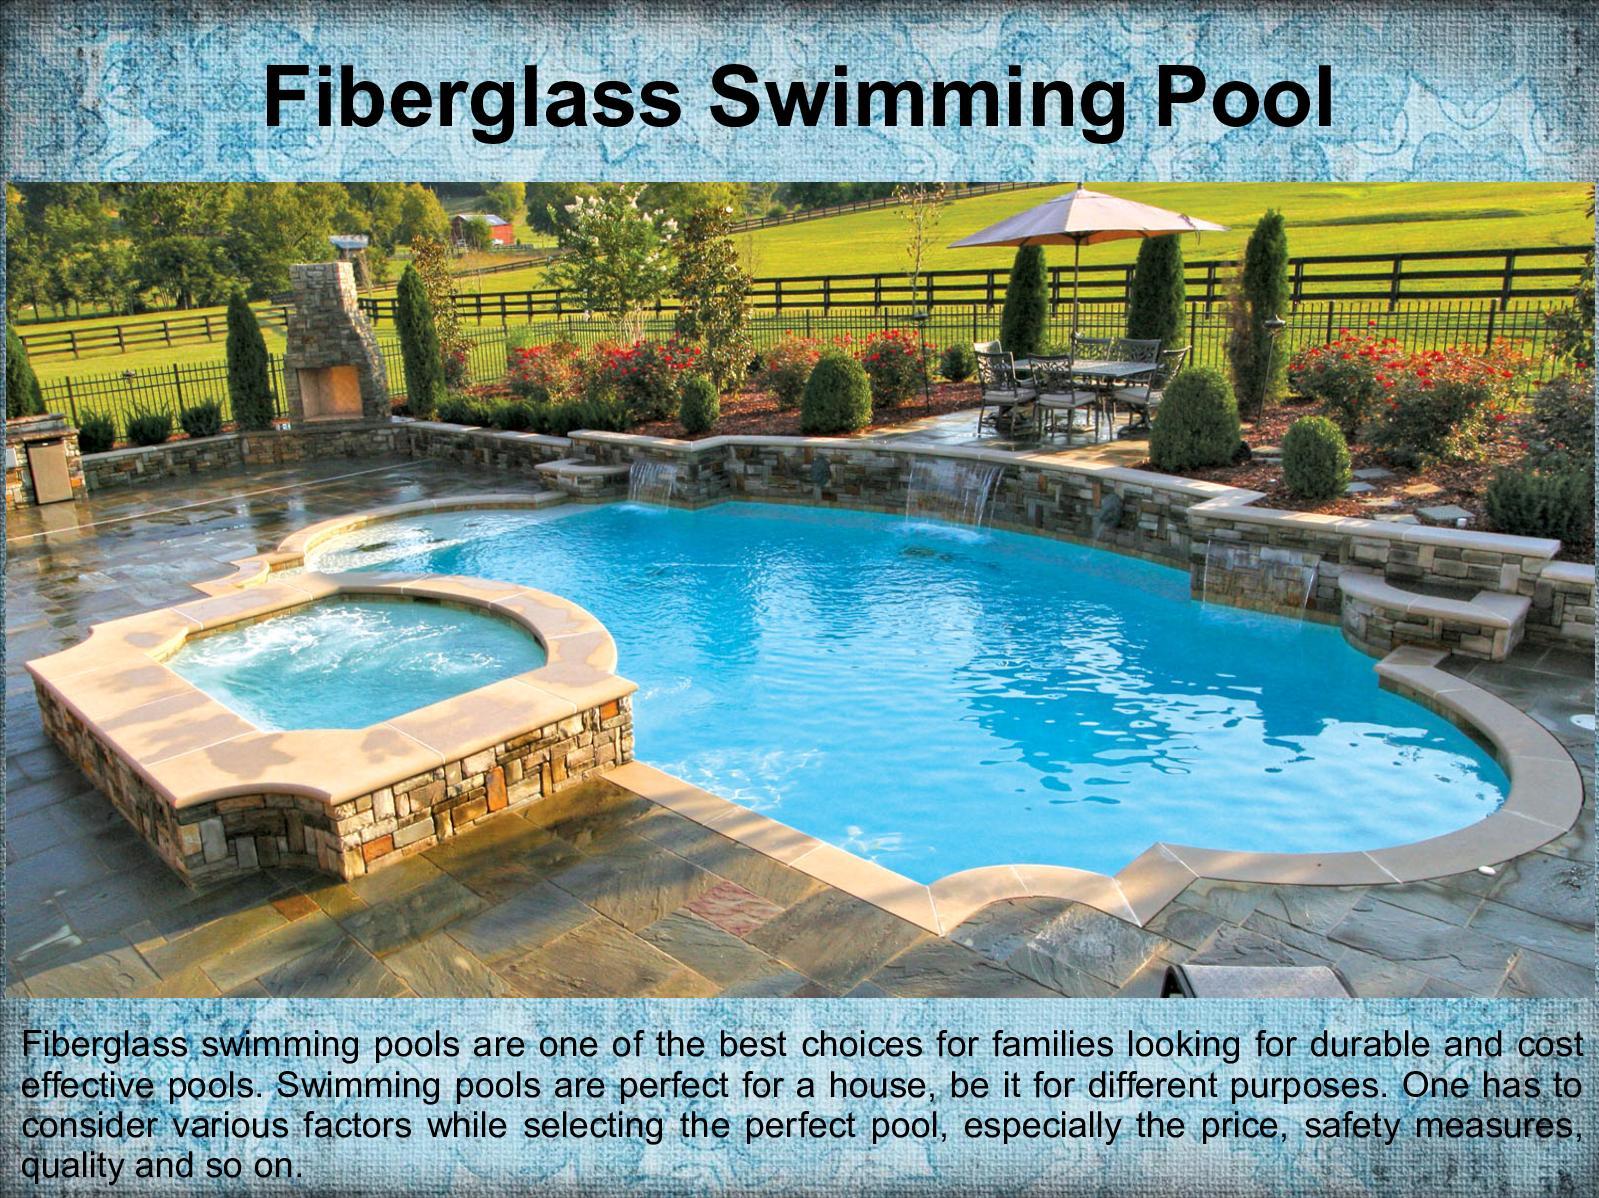 Calaméo - Benifits Fiberglass Swimming Pools